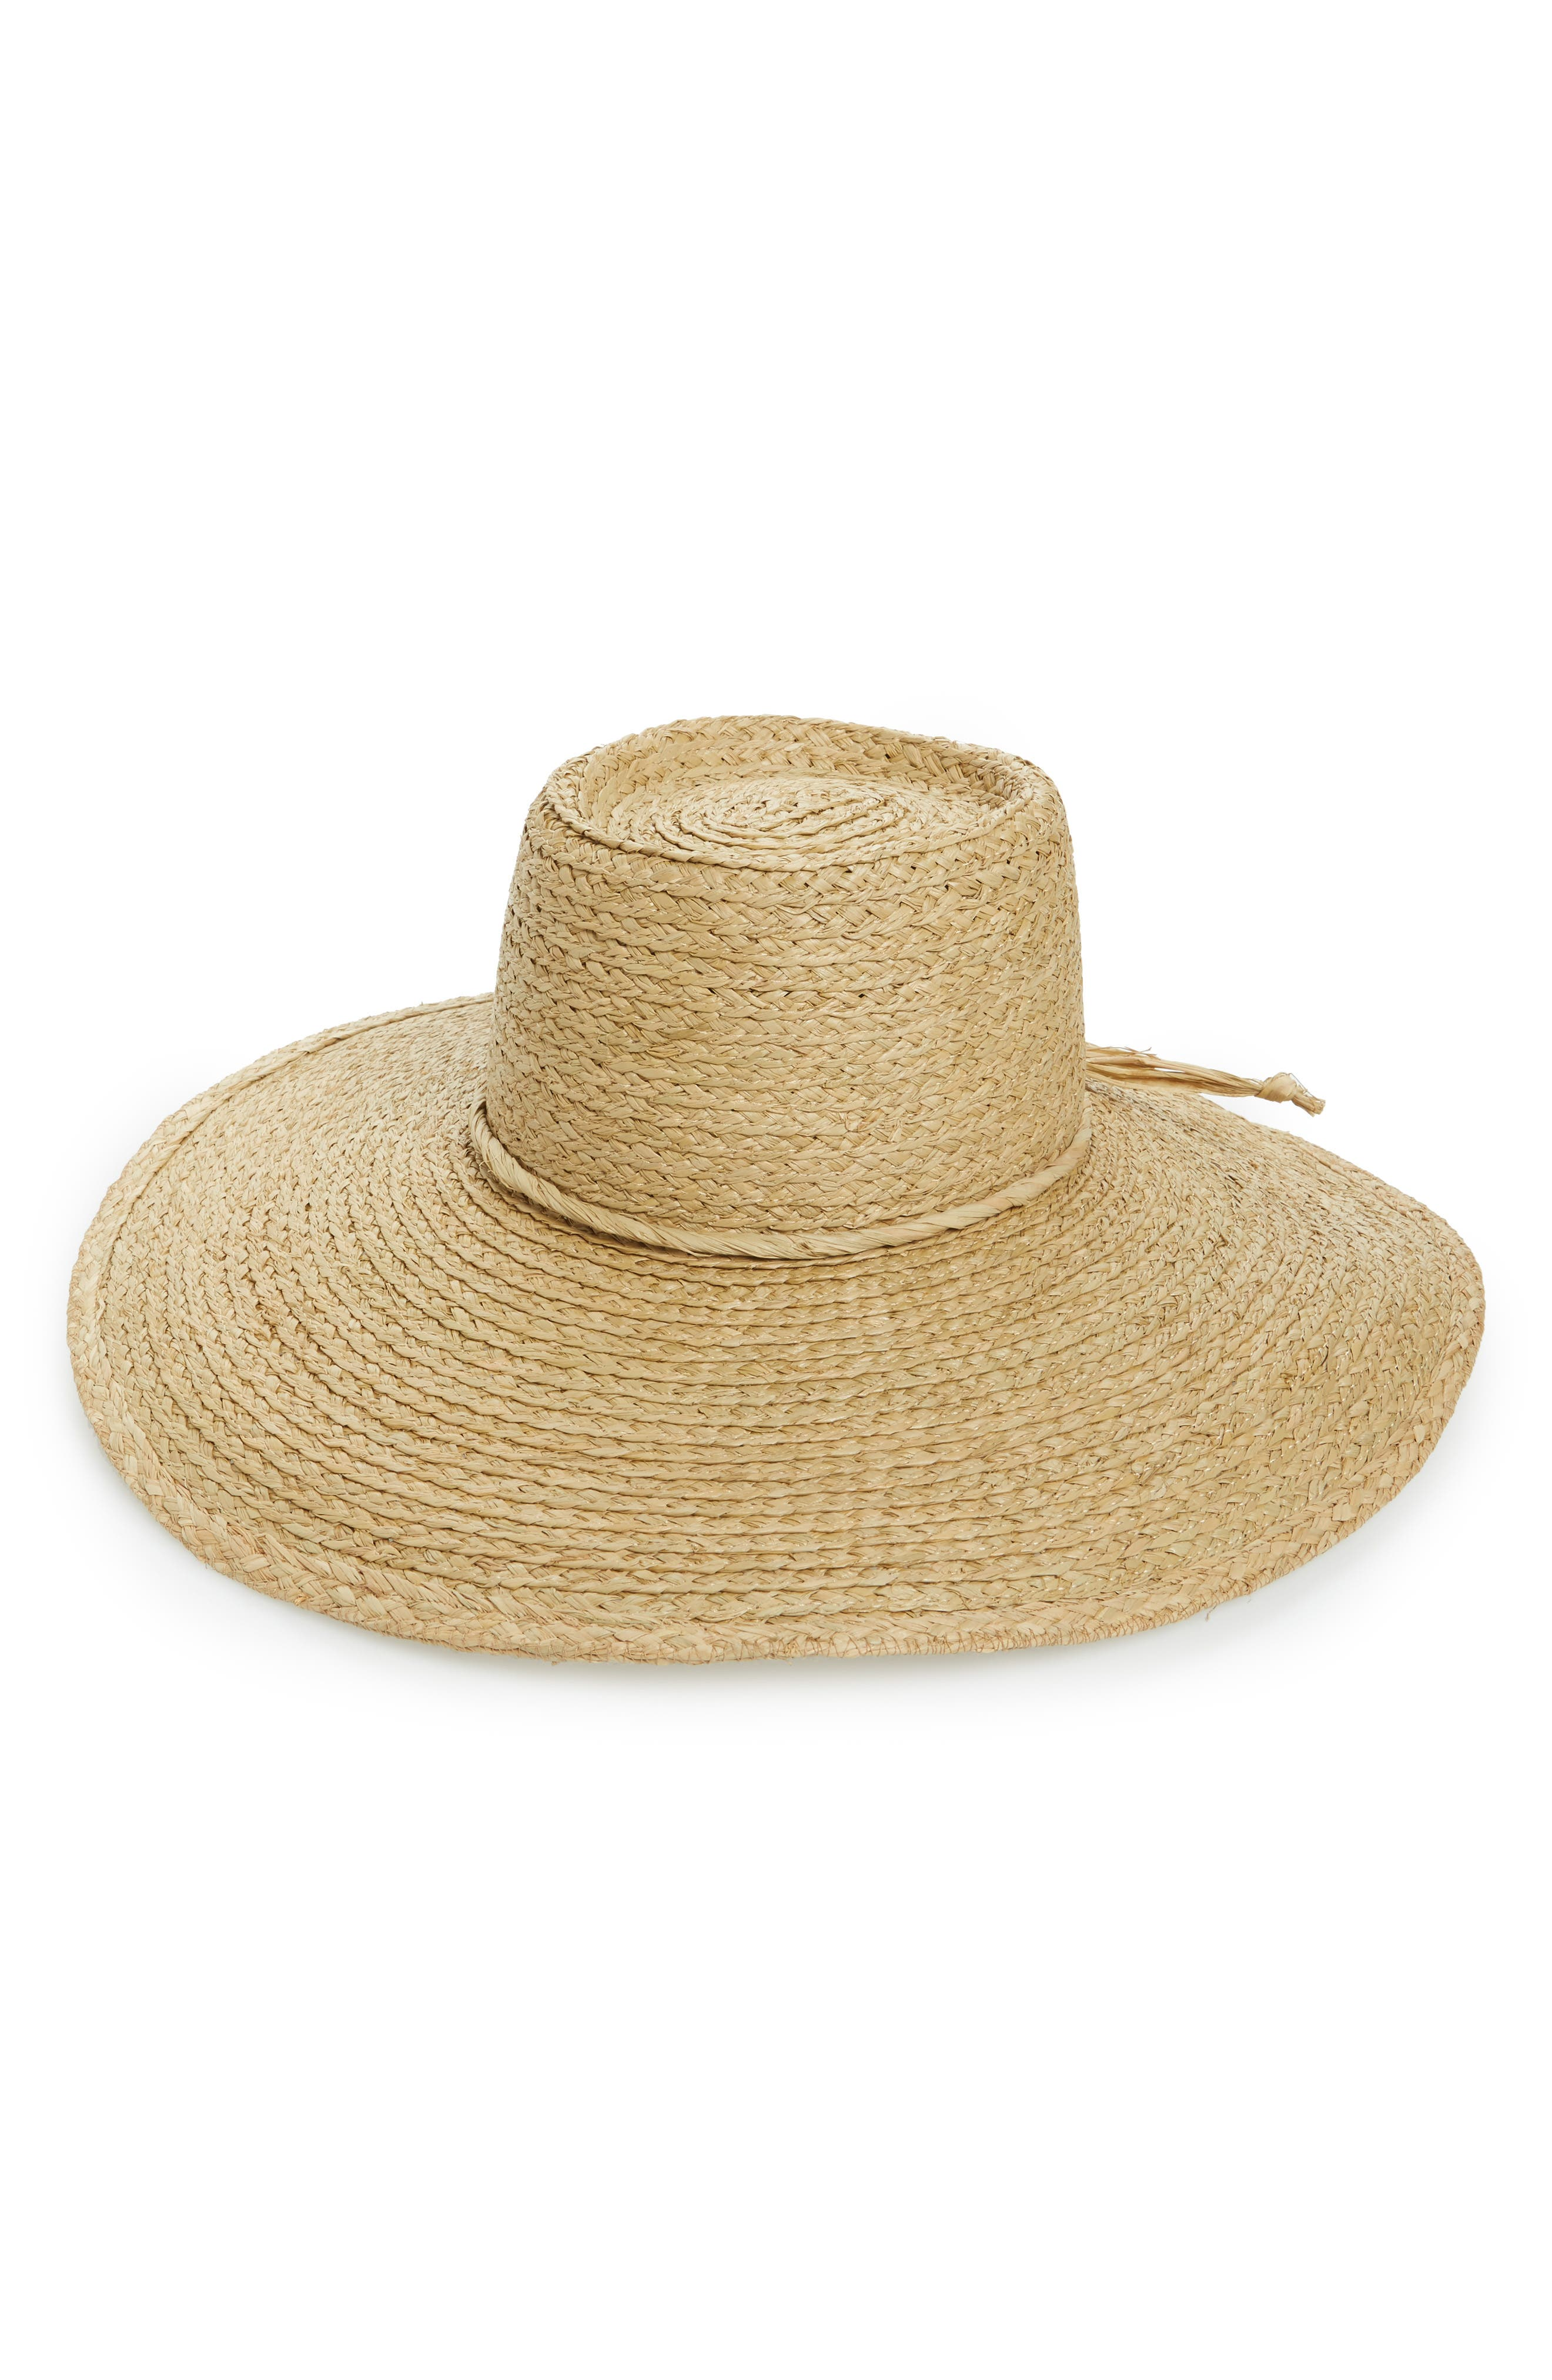 BRIXTON Paite Raffia Floppy Hat